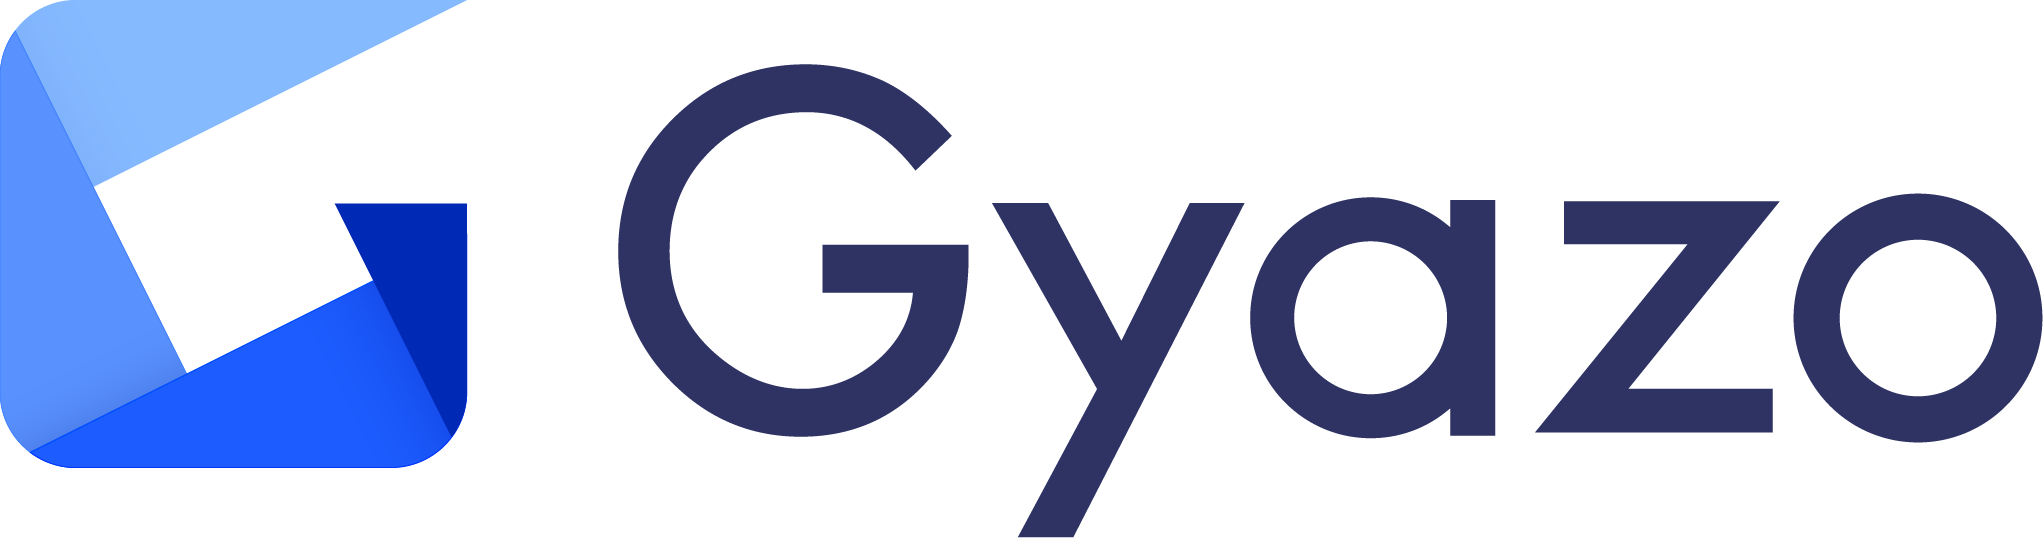 How can I launch Gyazo with hotkeys / key shortcuts? – Gyazo